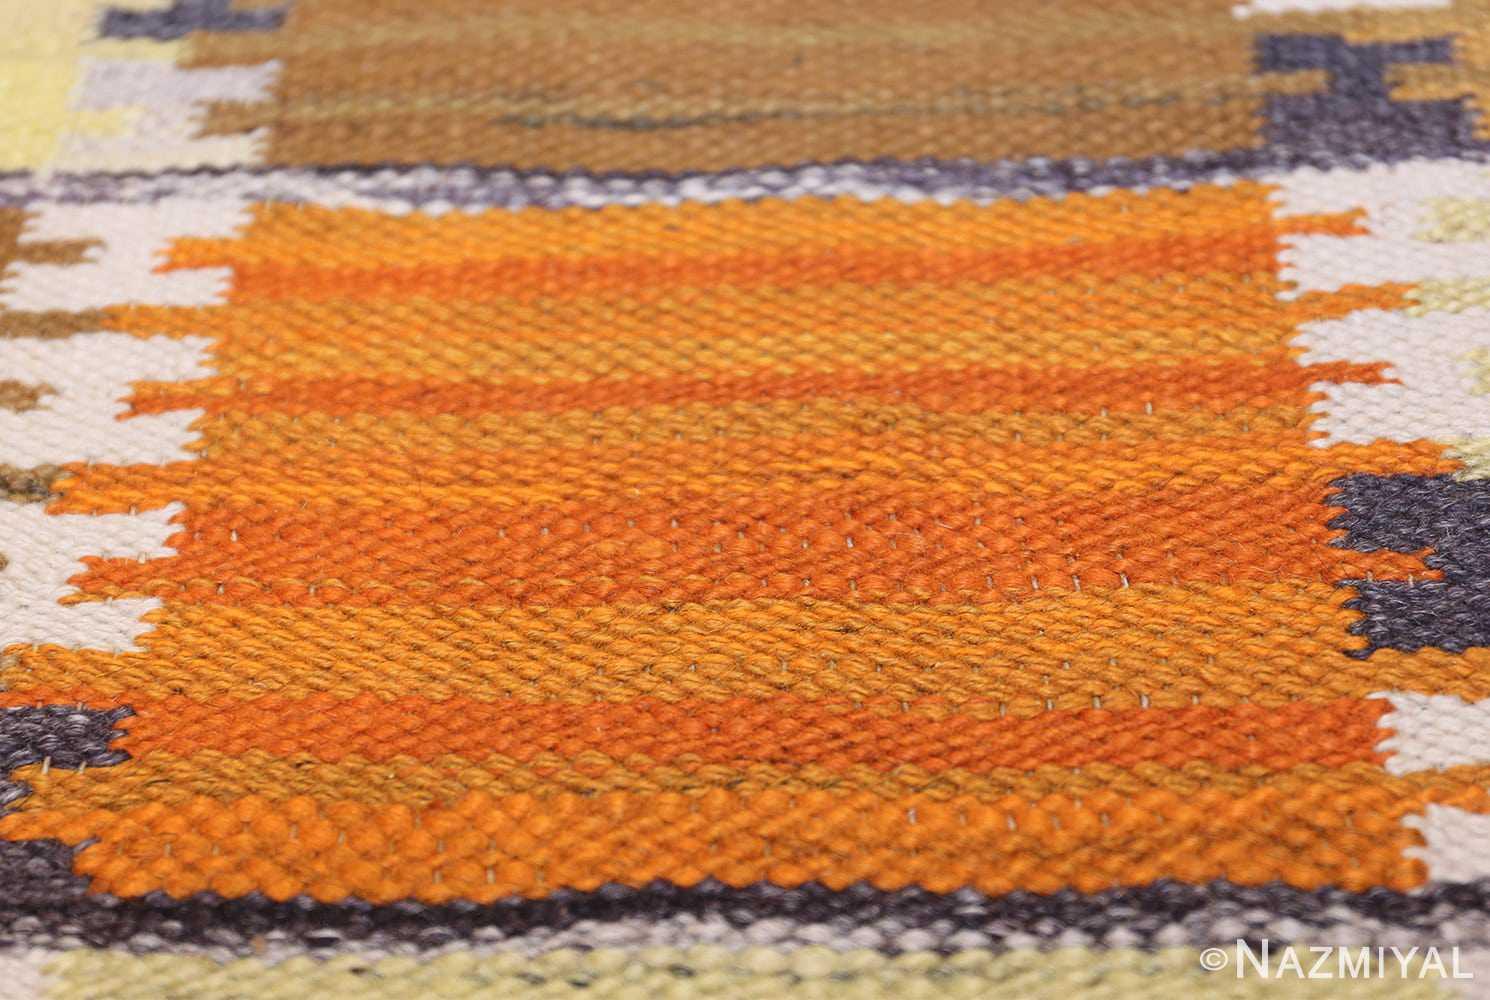 Vintage Scandinavian Rug by Wanda Krakow 46858 Orange Texture Nazmiyal